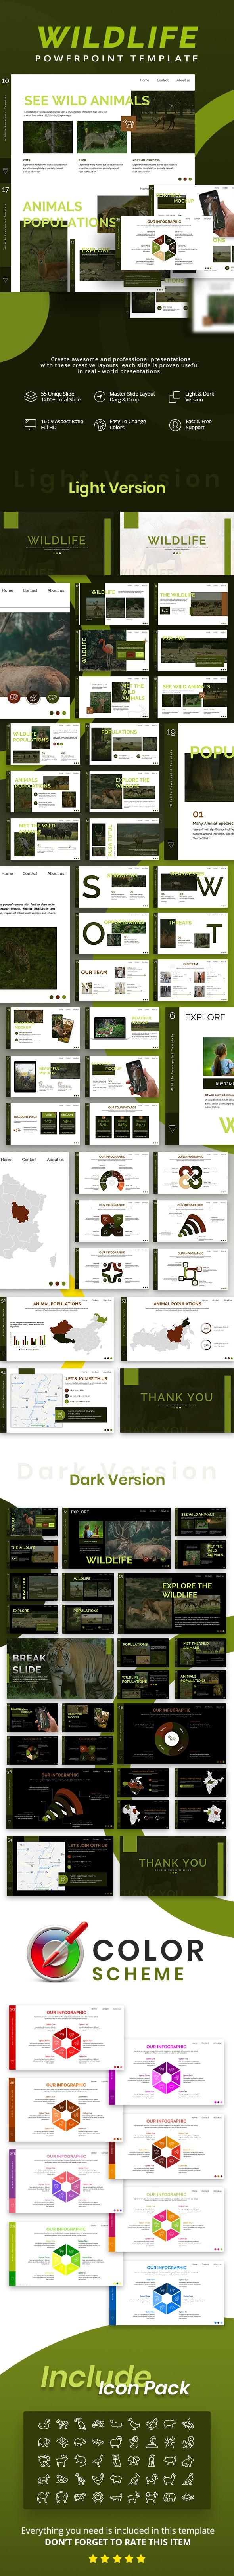 Wildlife Animal Keynote Template - Nature Keynote Templates